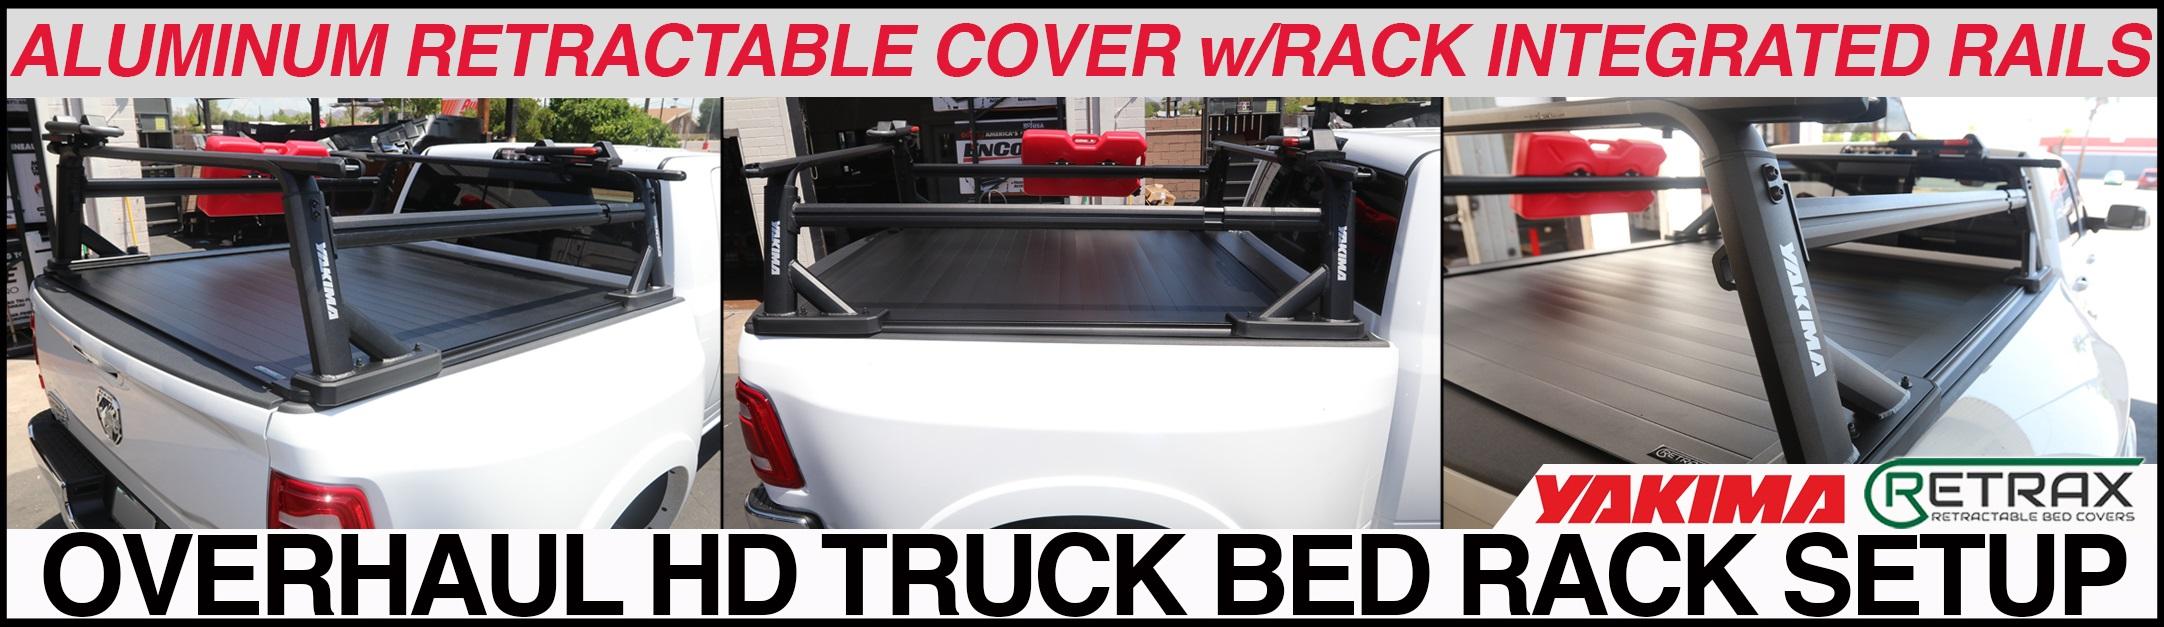 overhaul hd yakima rack truck access plus